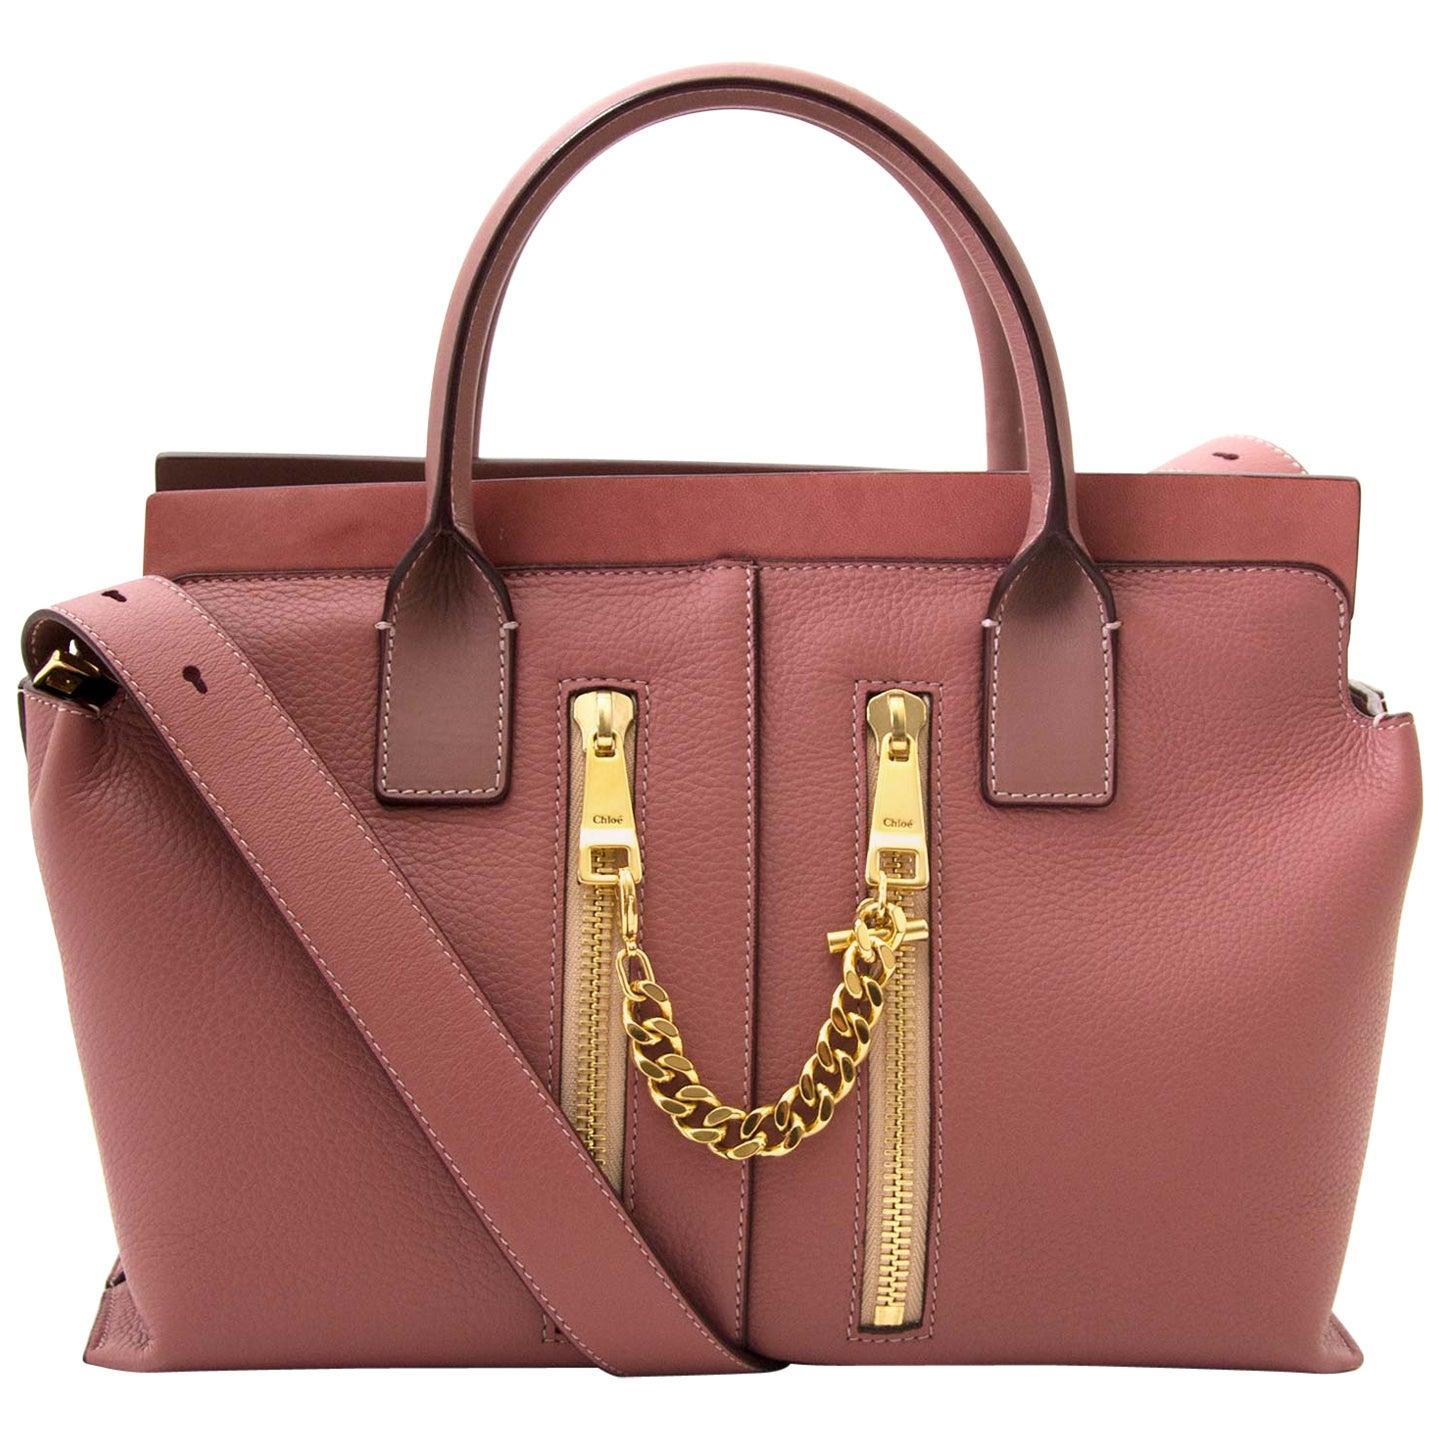 Chloe Pink Leather Cate Zipper Satchel Bag